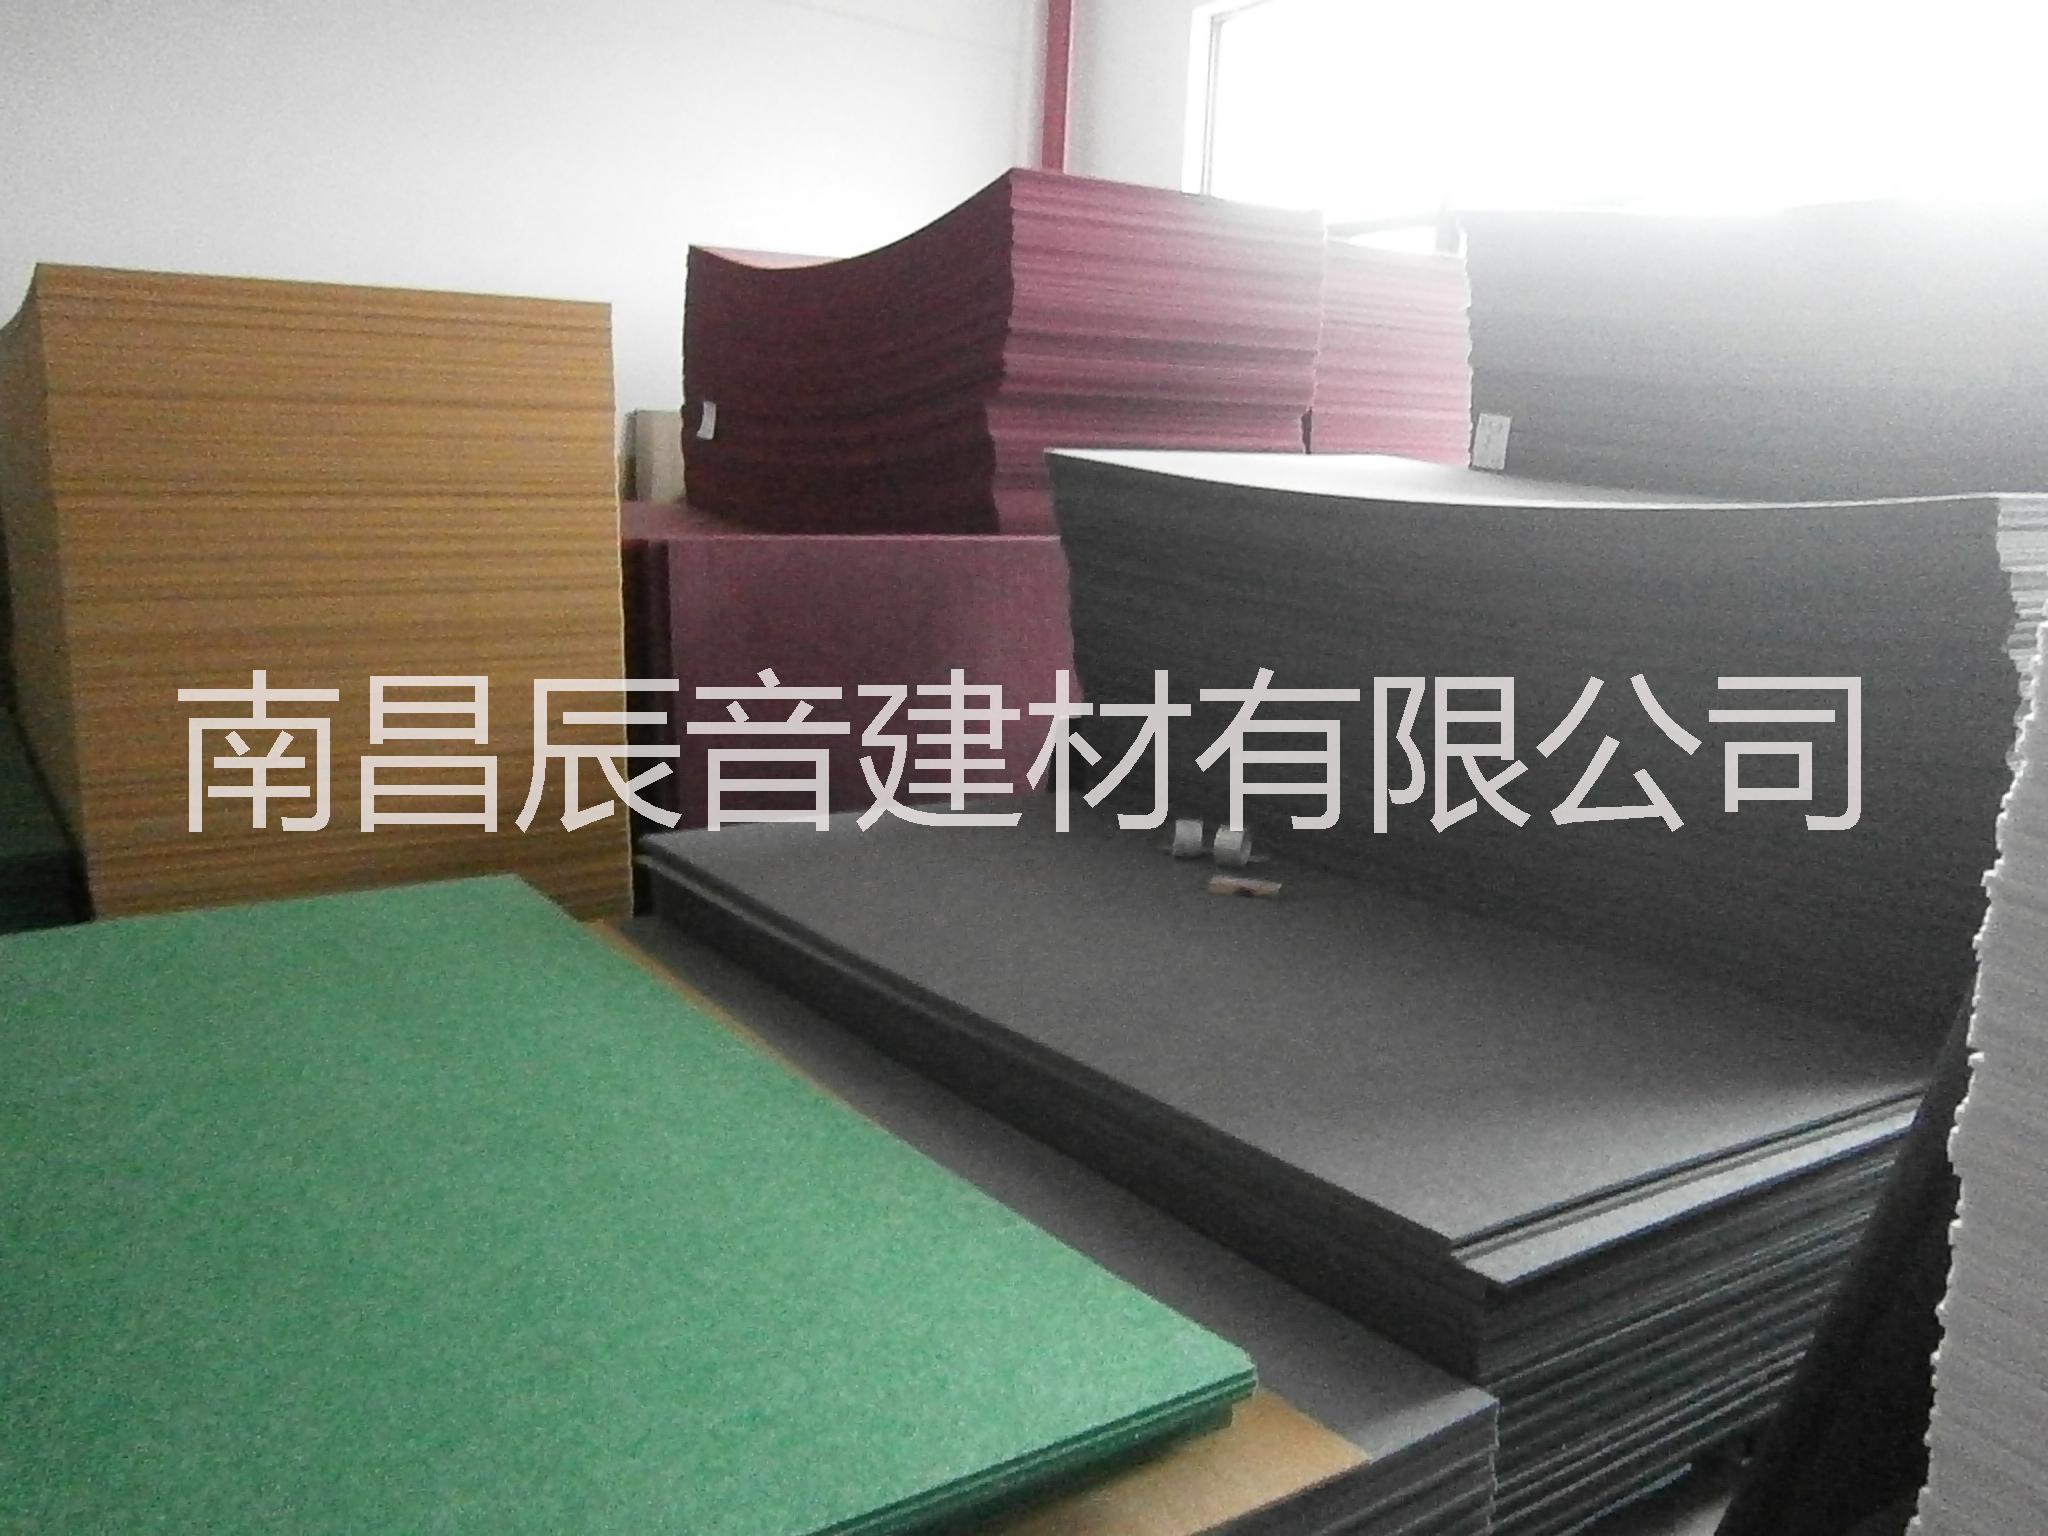 KTV吸音板|南丰县酒吧吸音材料价格|崇仁县琴房装饰吸音板厂家|乐安县聚酯纤维吸音板厂家